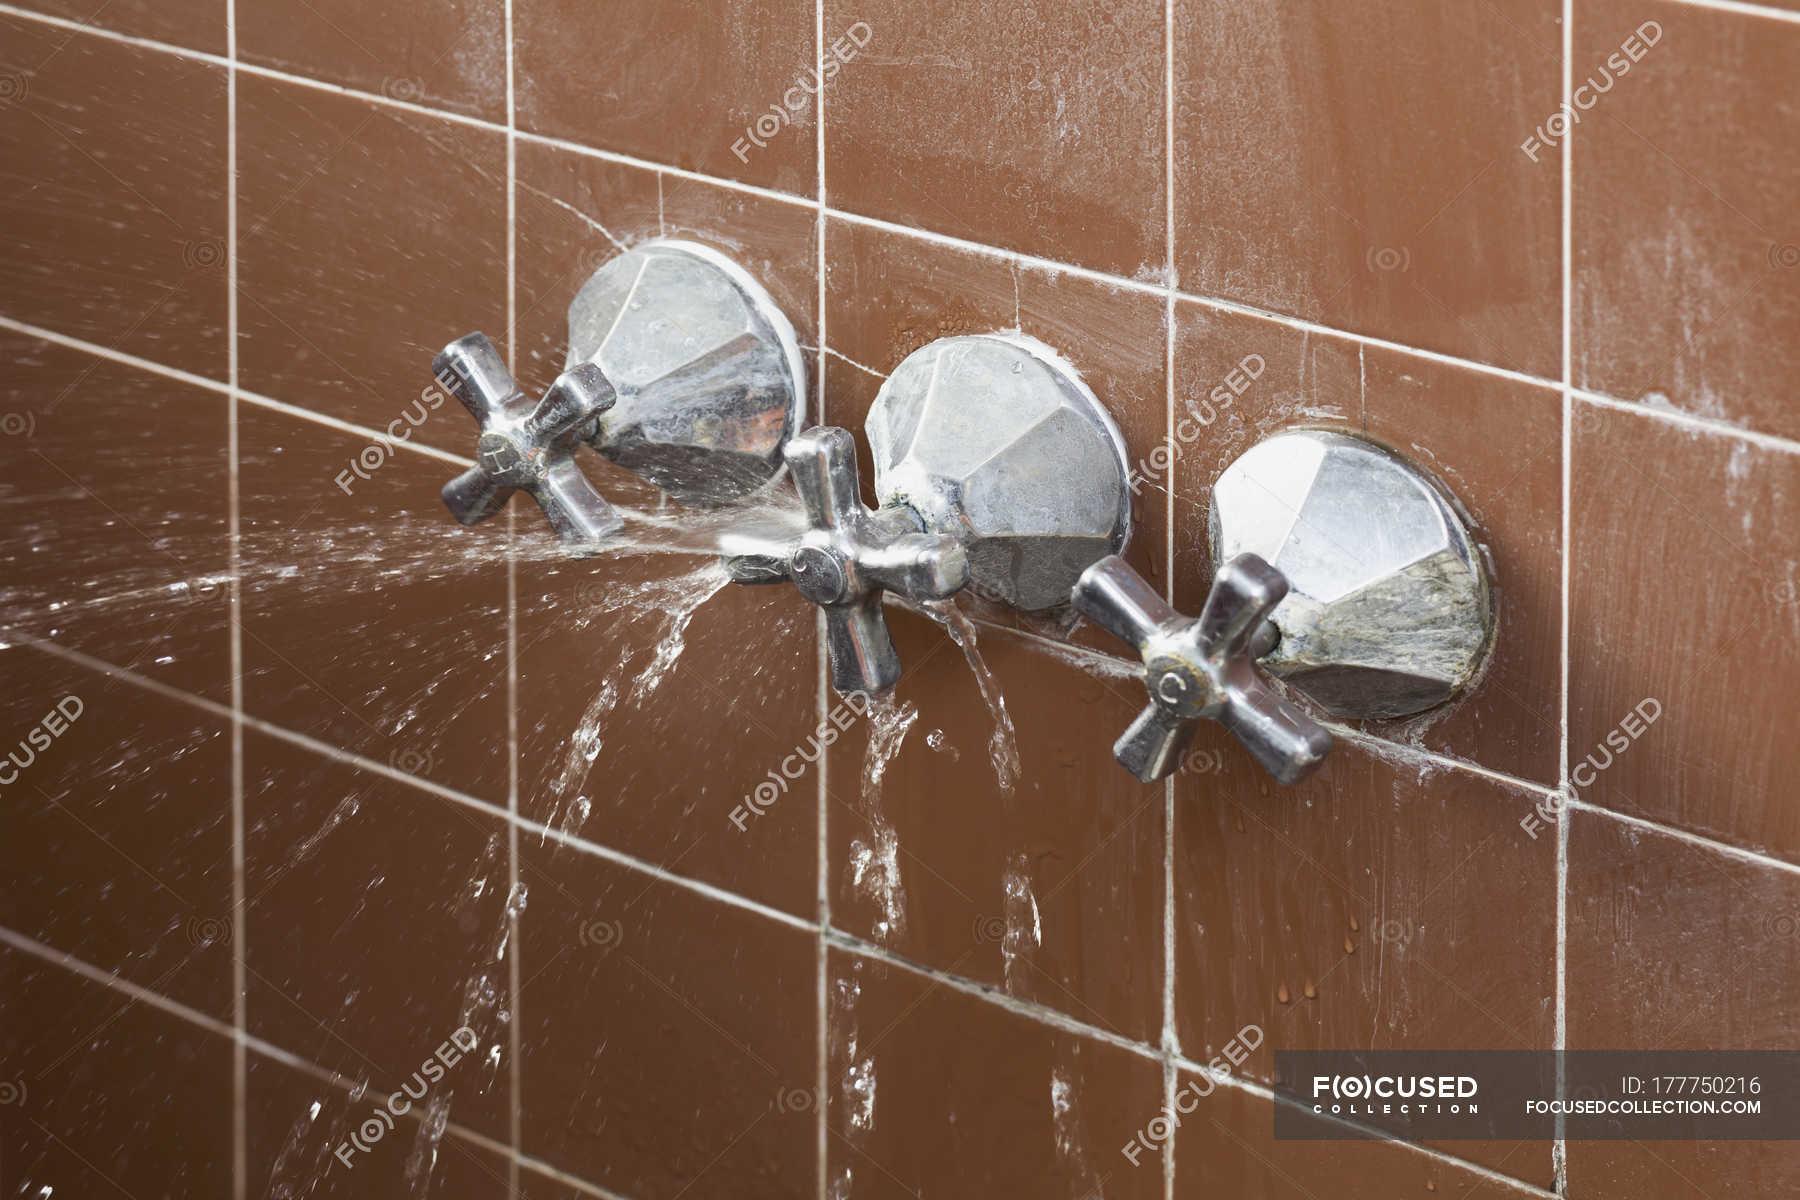 broken shower faucet handle spraying